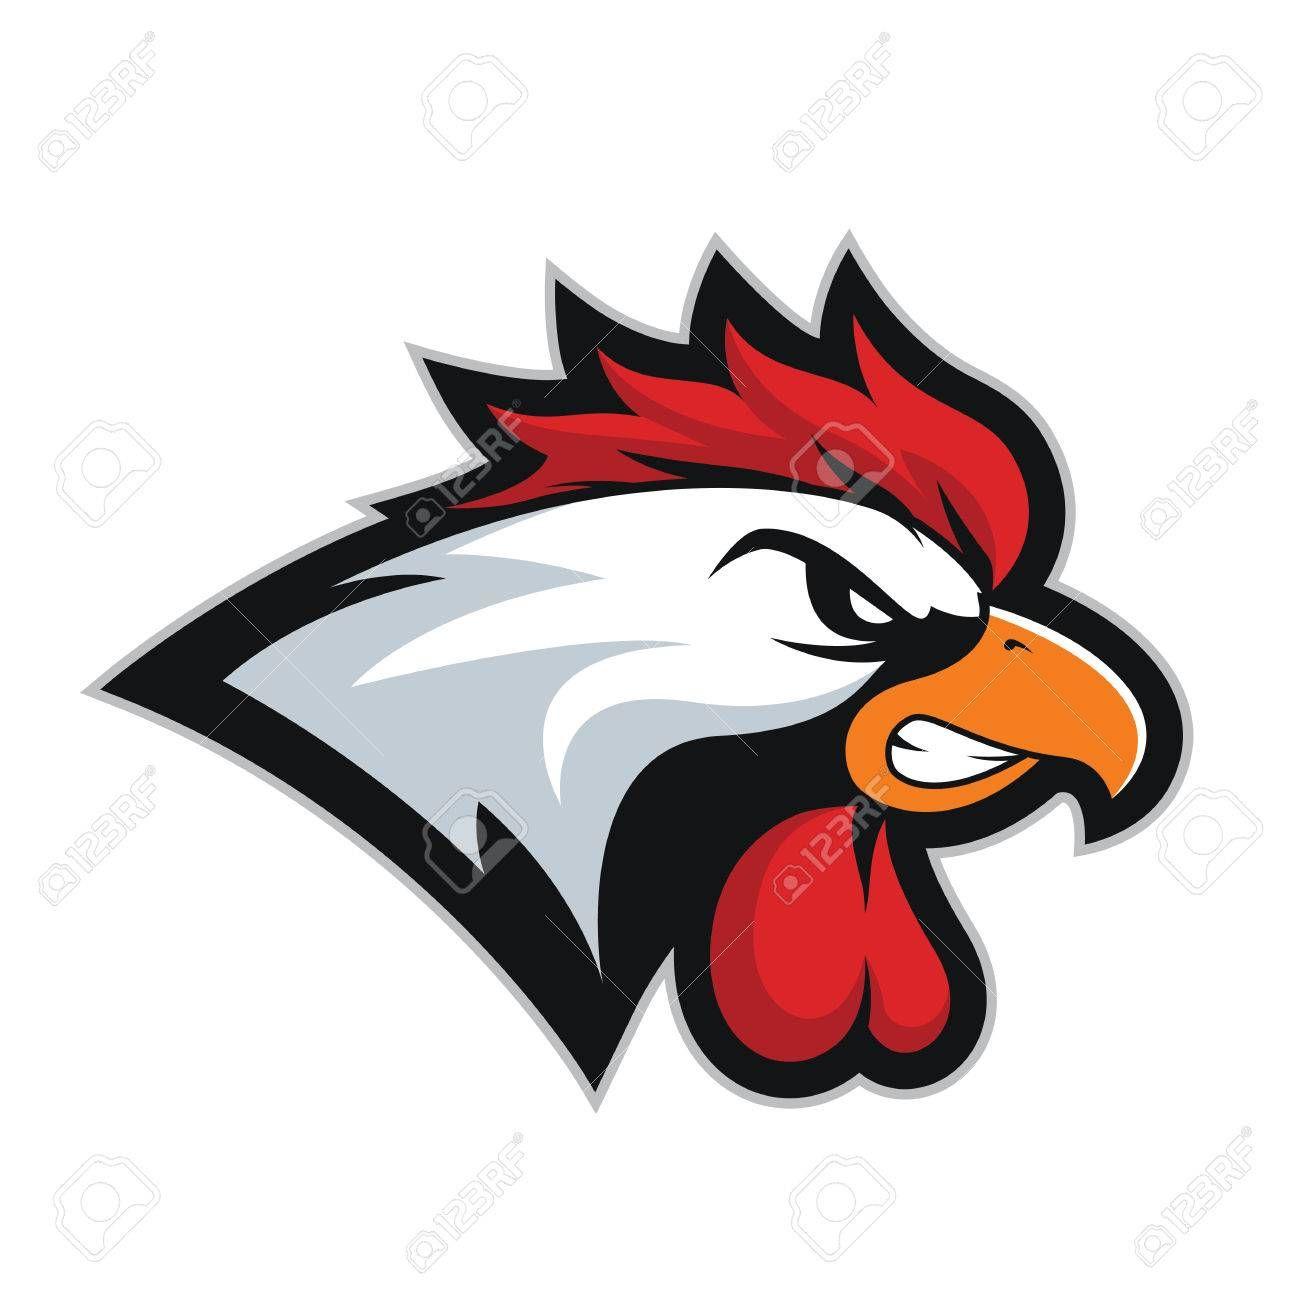 Chicken Rooster Head Mascot 2 Illustration Affiliate Rooster Chicken Head Illustration Mascot Rooster Art Chicken Illustration Rooster